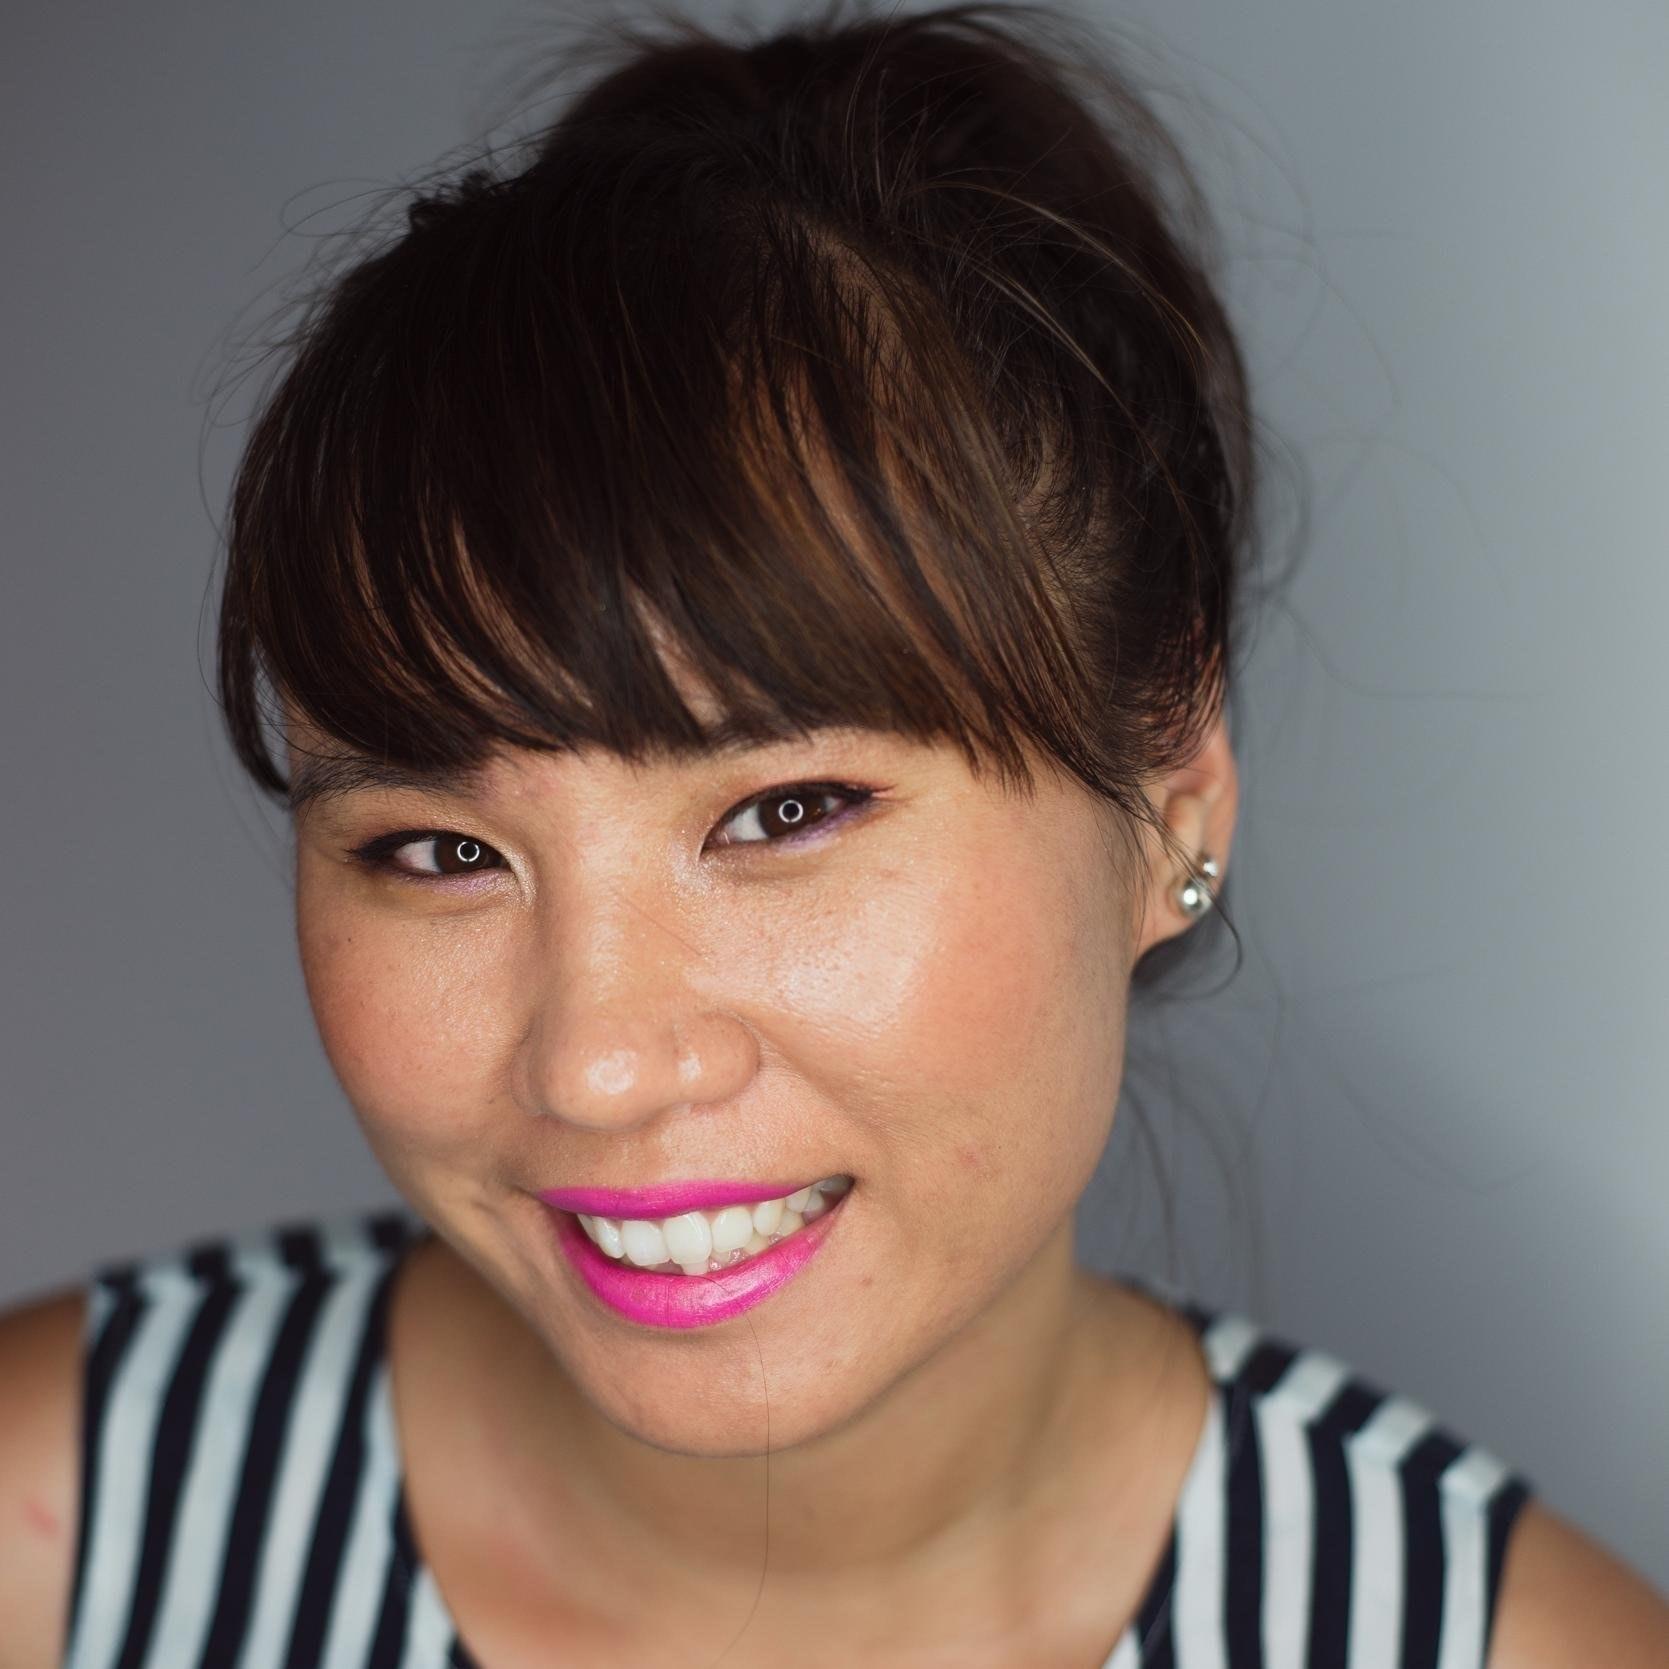 Christina Ting